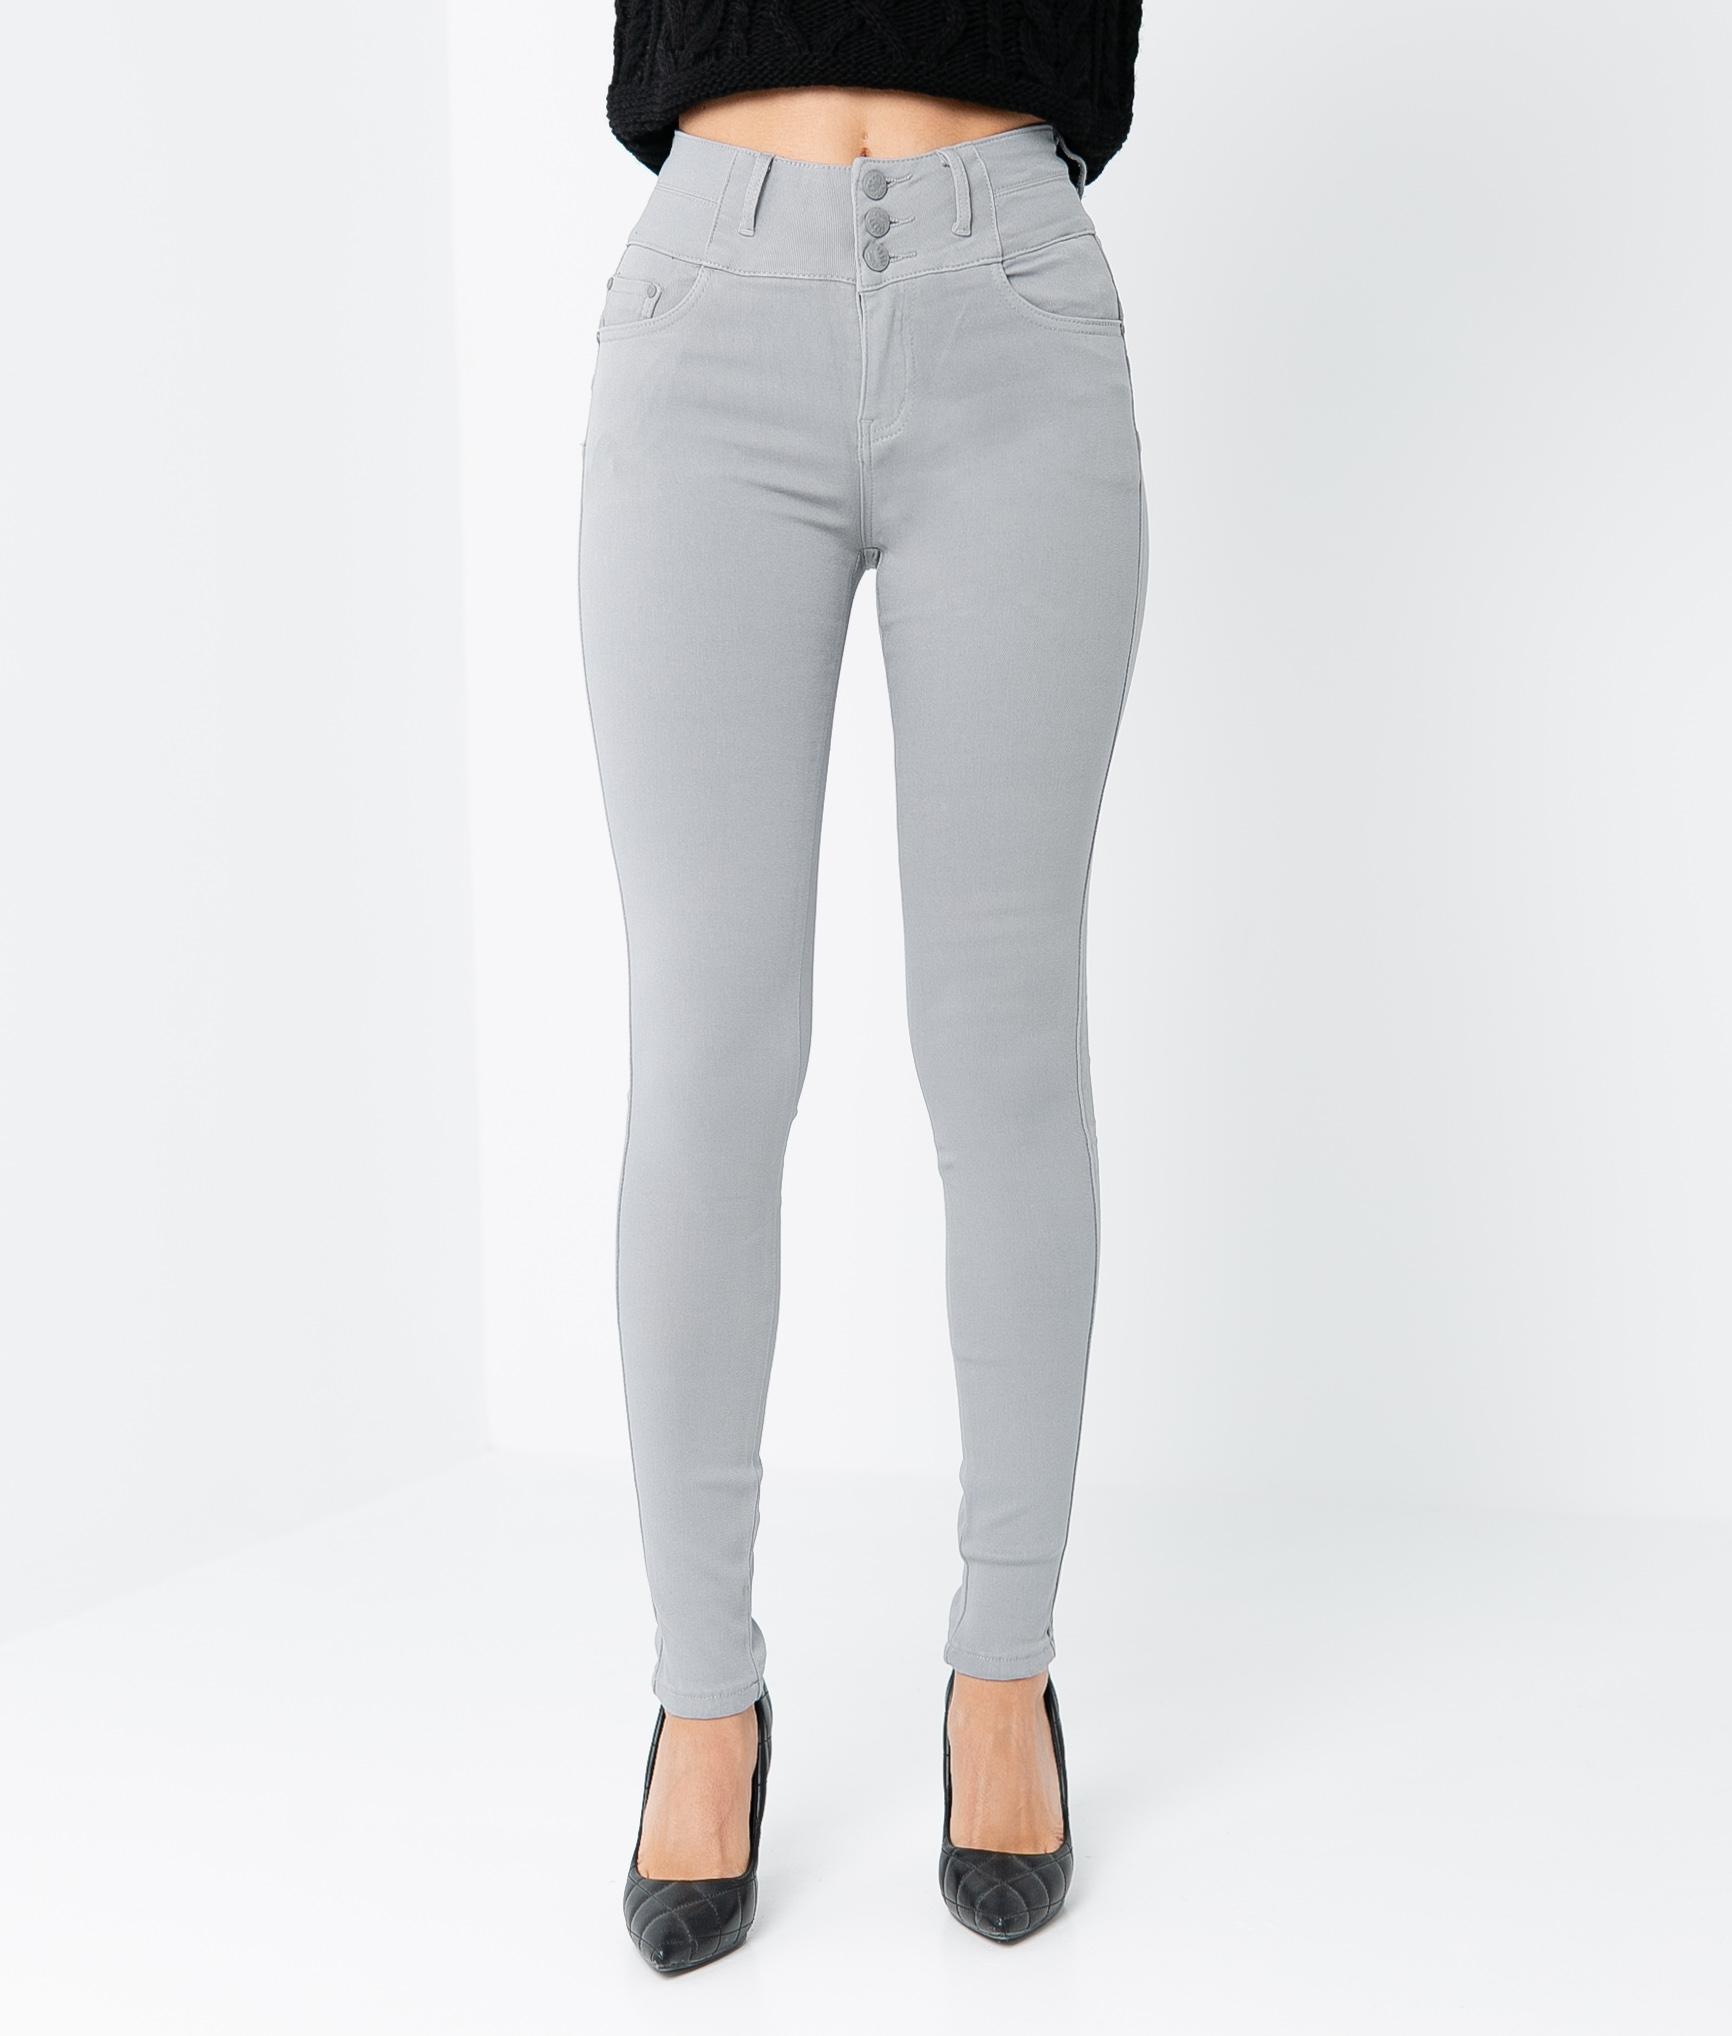 Trousers Subama - Gris